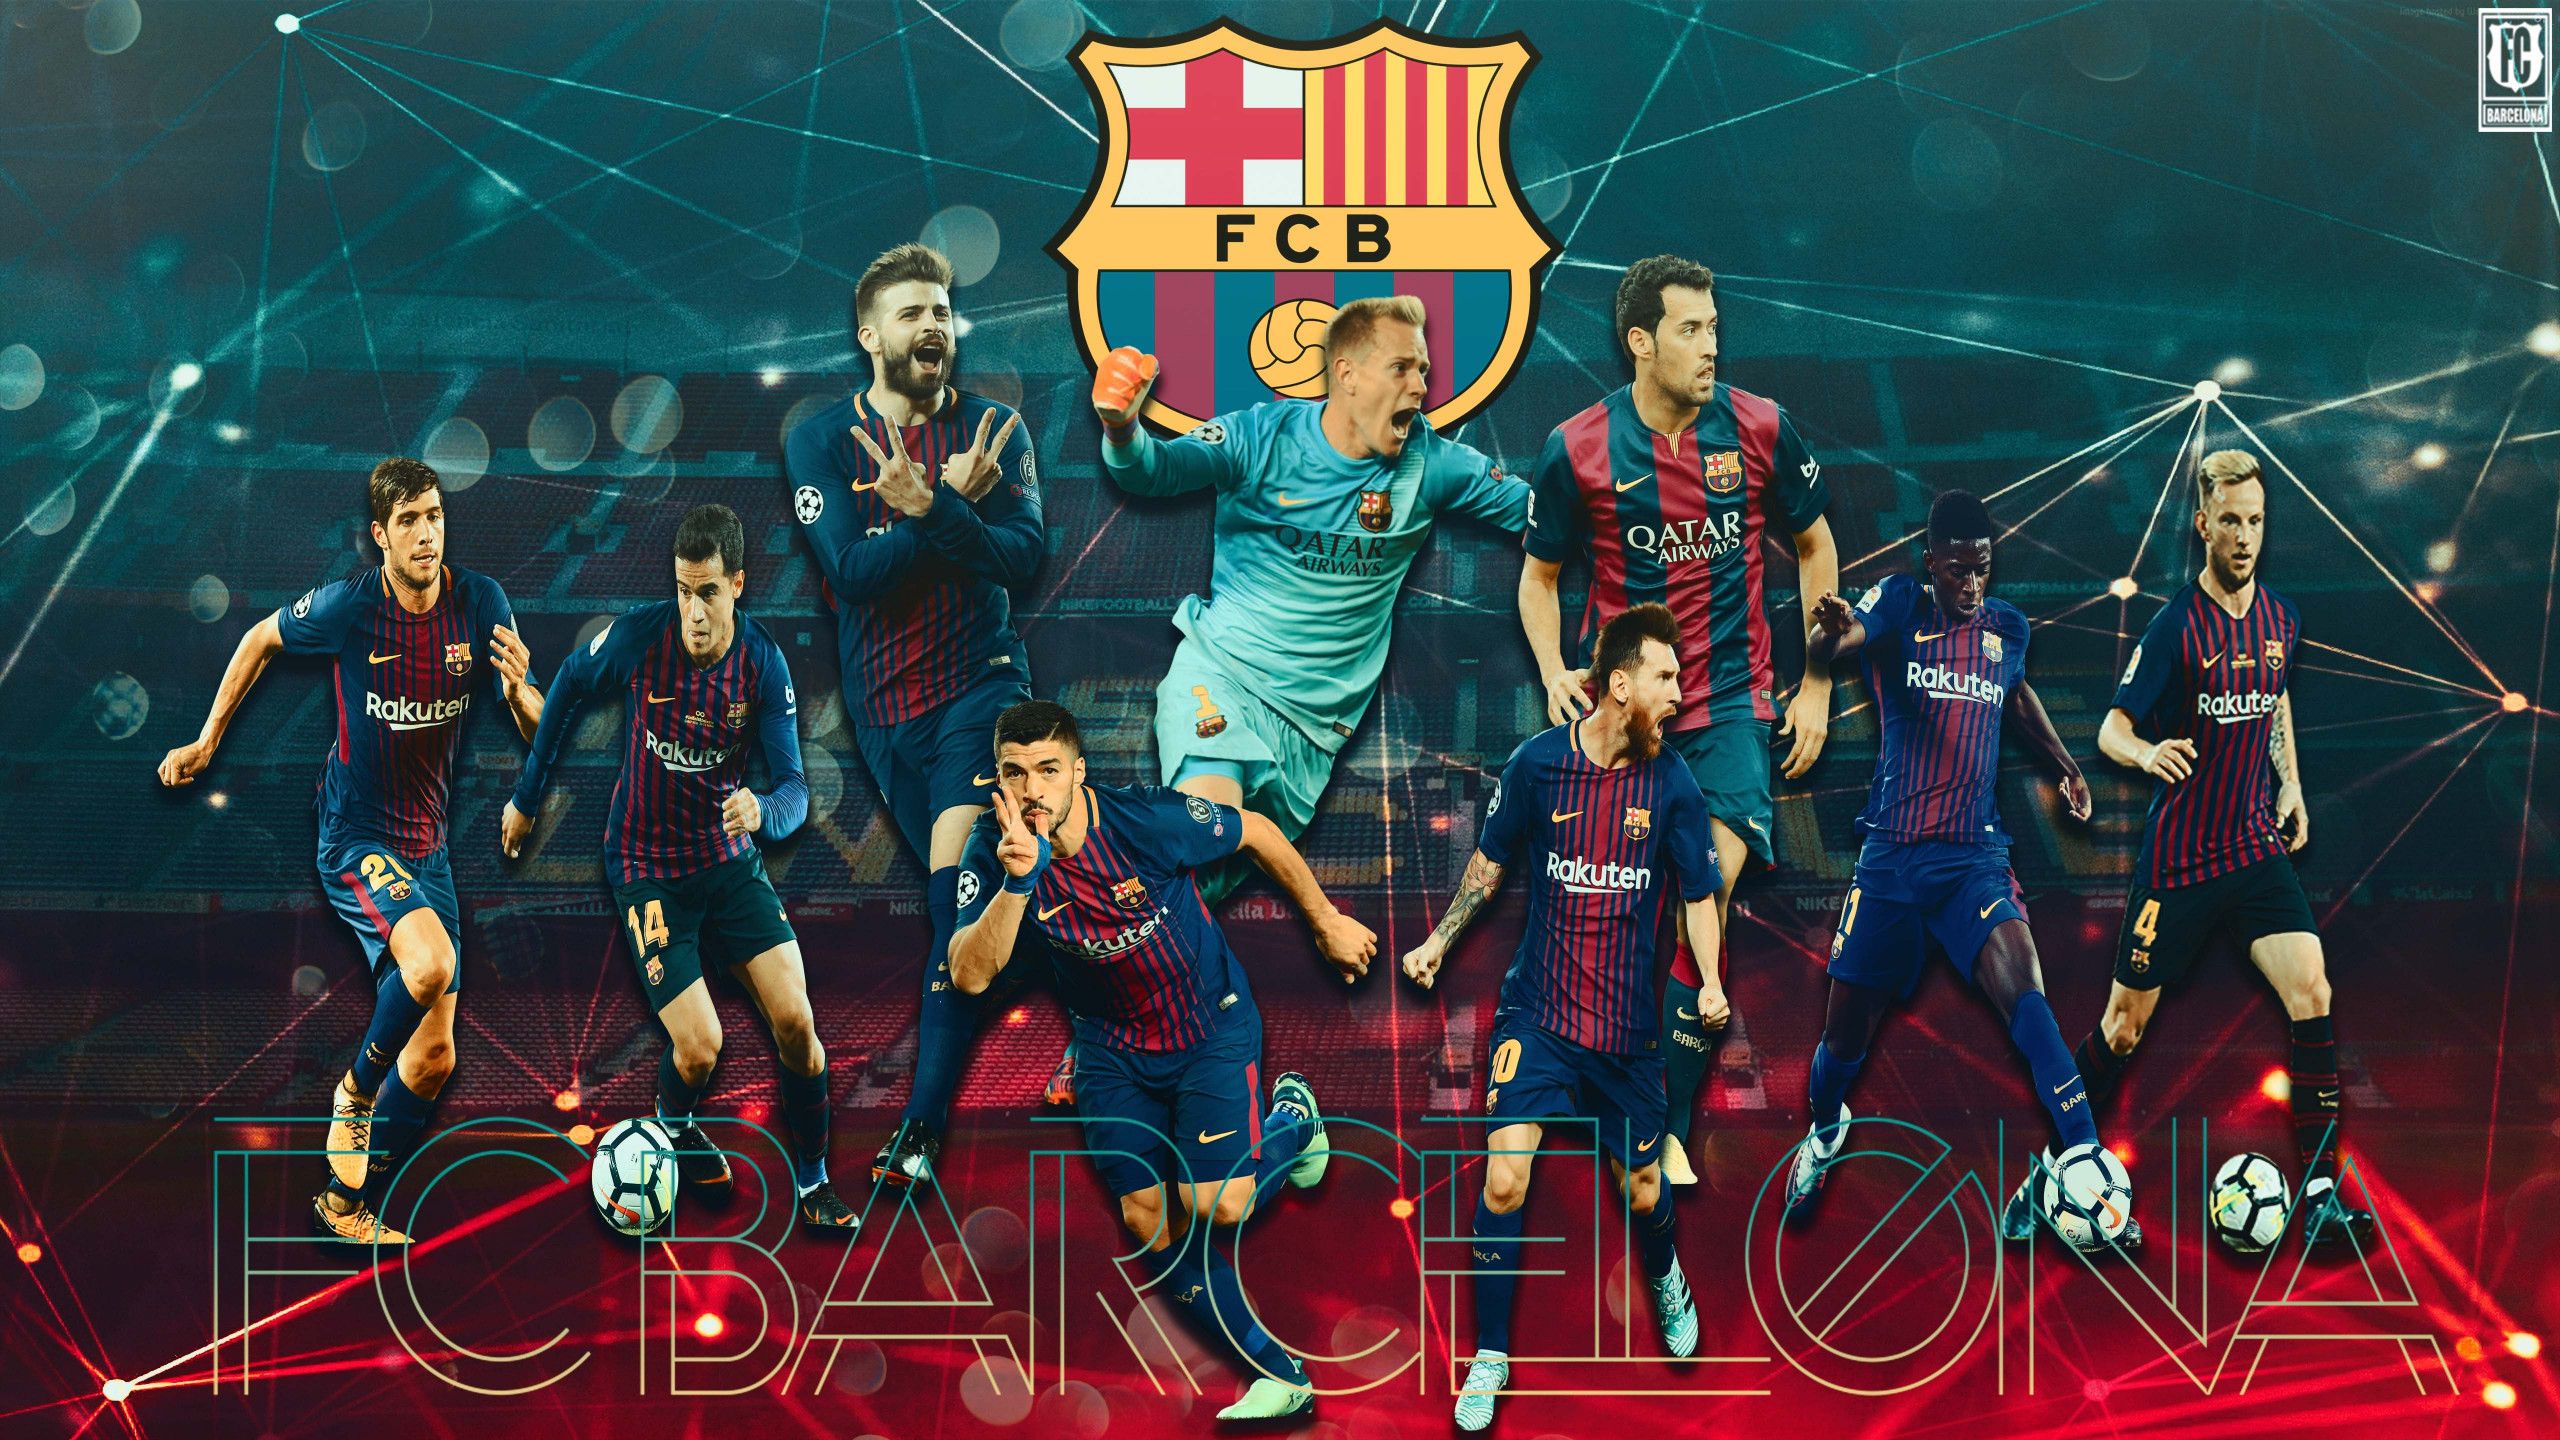 Download wallpaper FC Barcelona 2560x1440 2560x1440